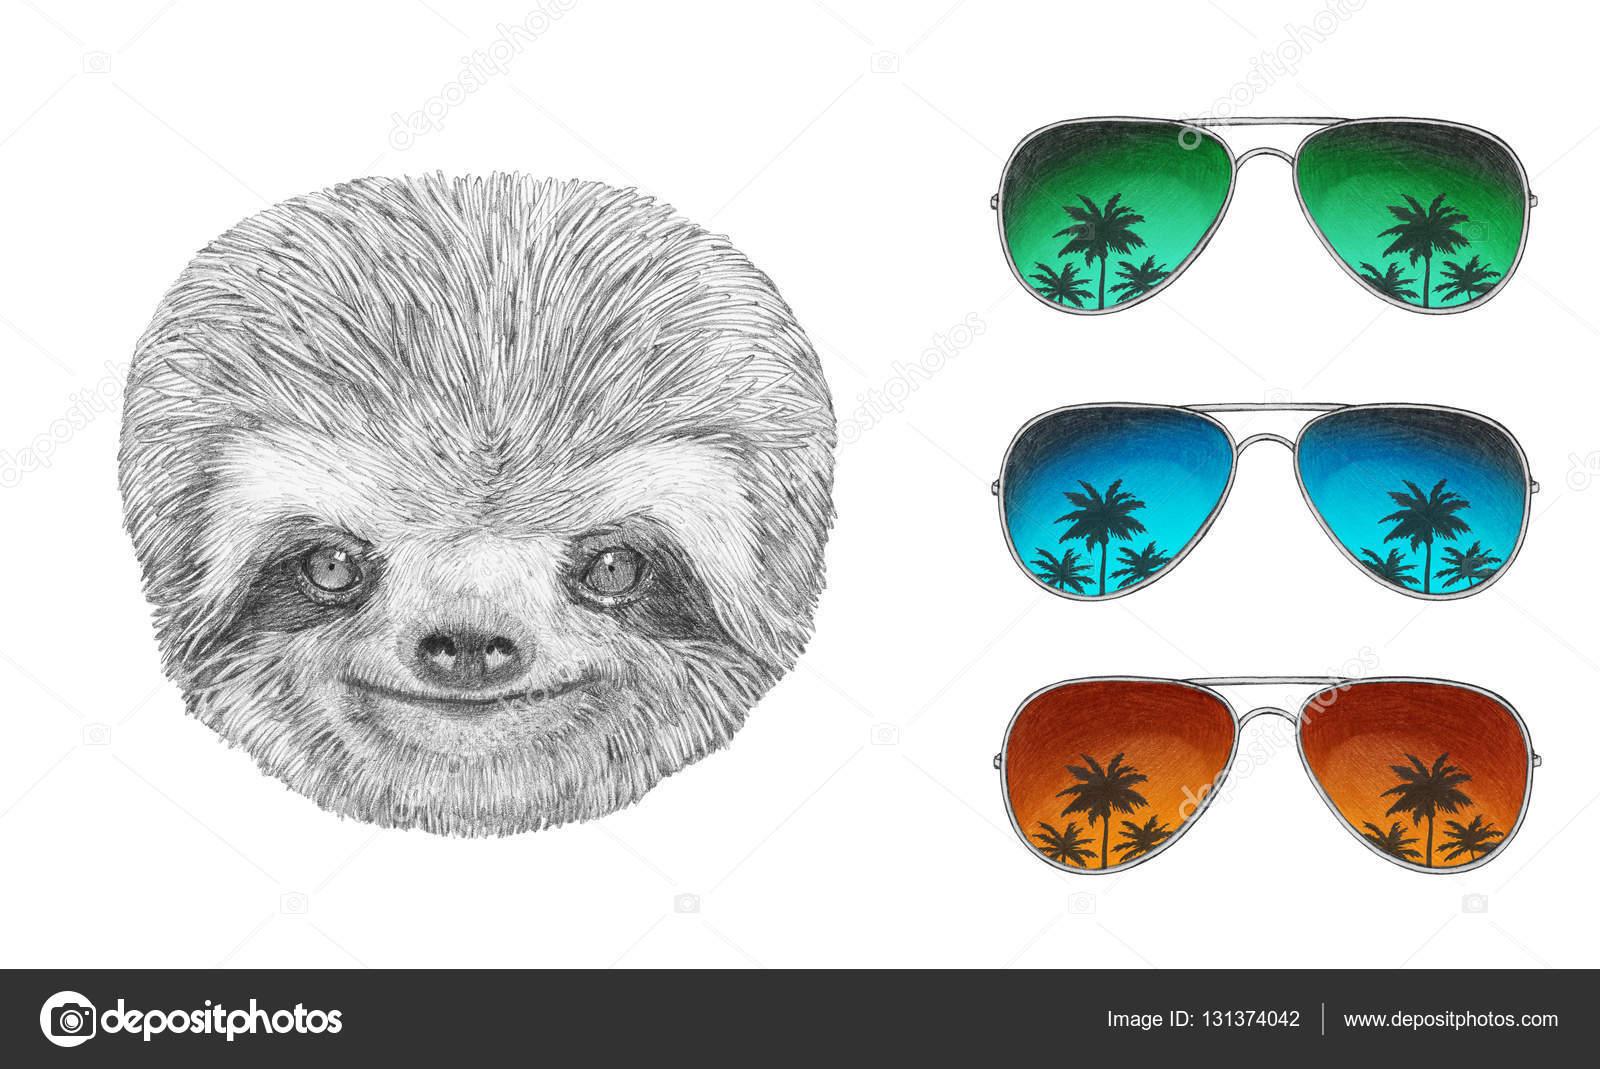 sloth with mirror sunglasses stock photo victoria novak 131374042